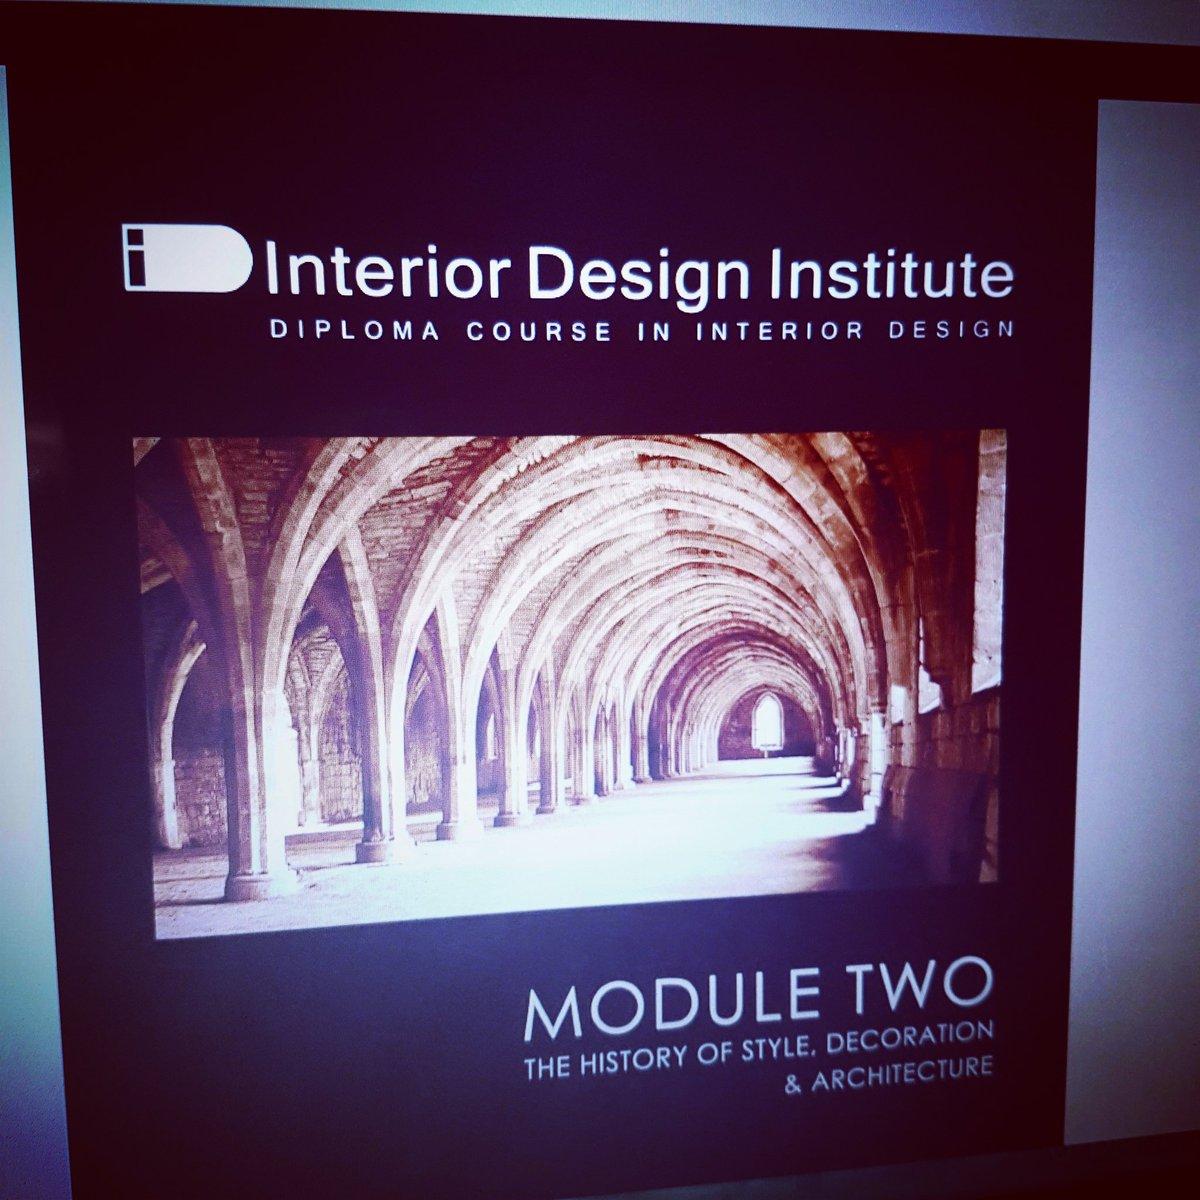 Beau #housedesign #idistudent #3dhomeimpressions #backtoschool # Theinteriordesigninstitute #lovearchitecture #architecture  #historypic.twitter.com/OwnoBvJyh7